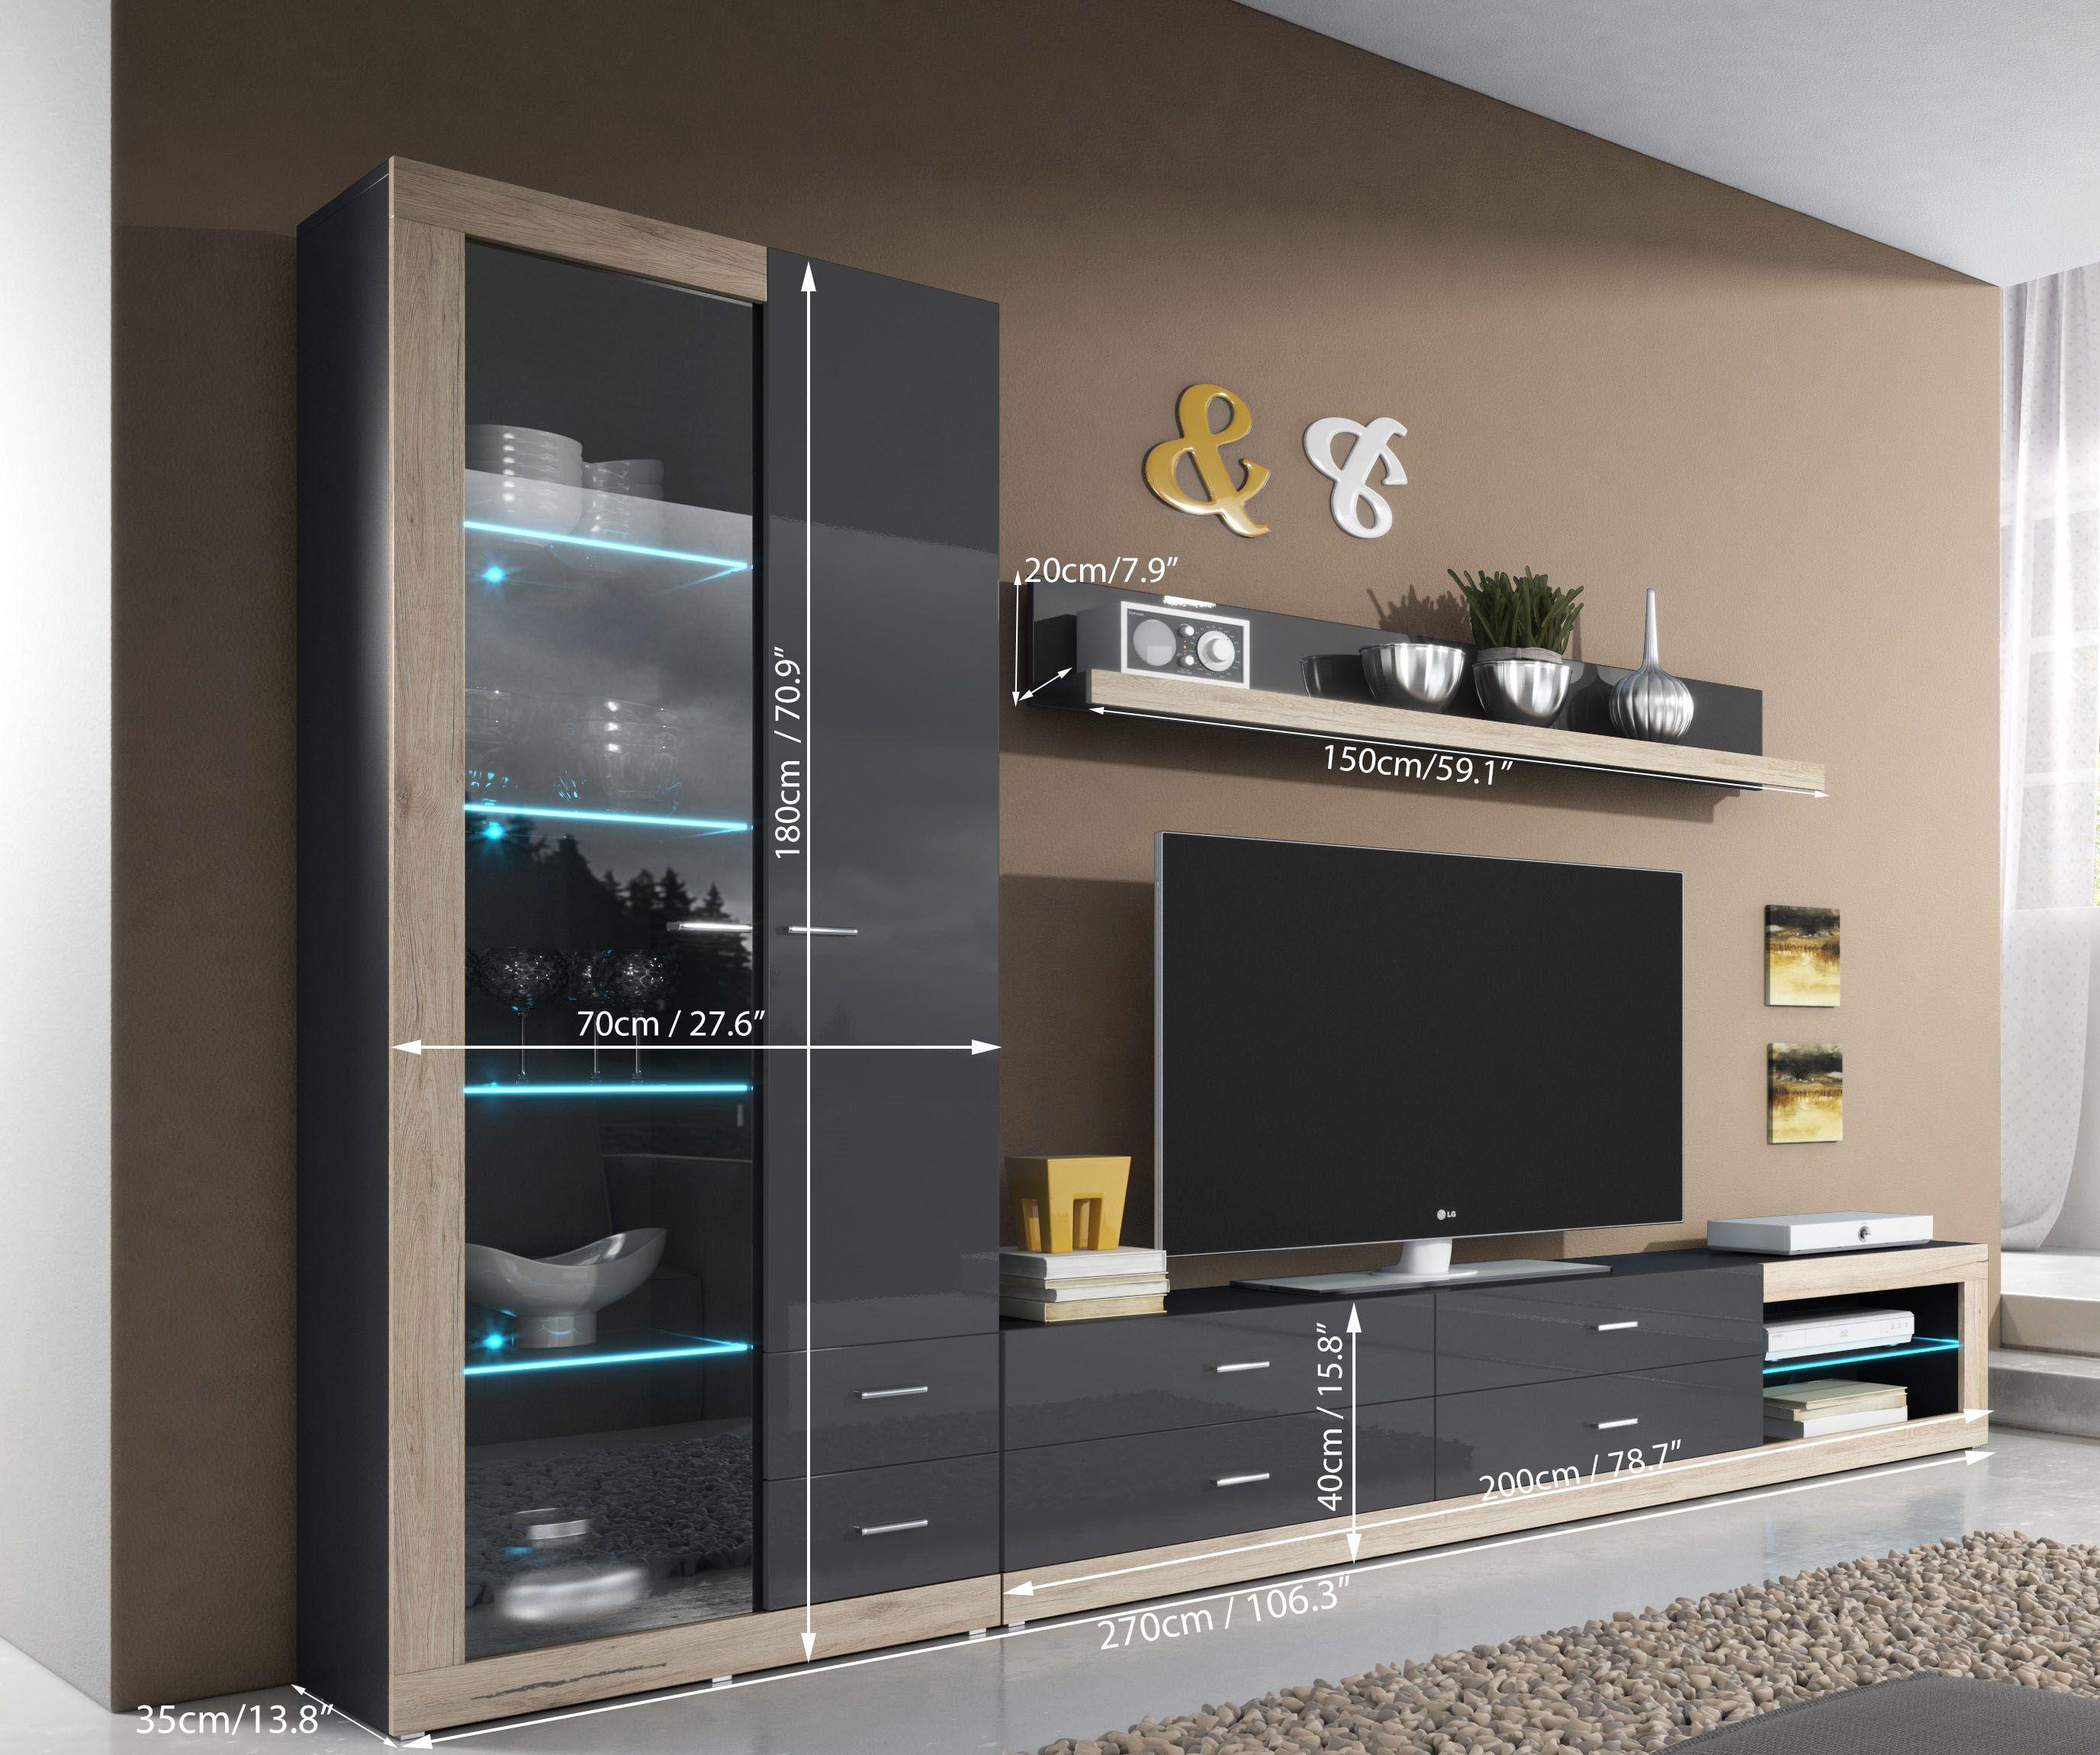 Wall unit Tessa 2 | Living room wall units, Wall unit designs and ...